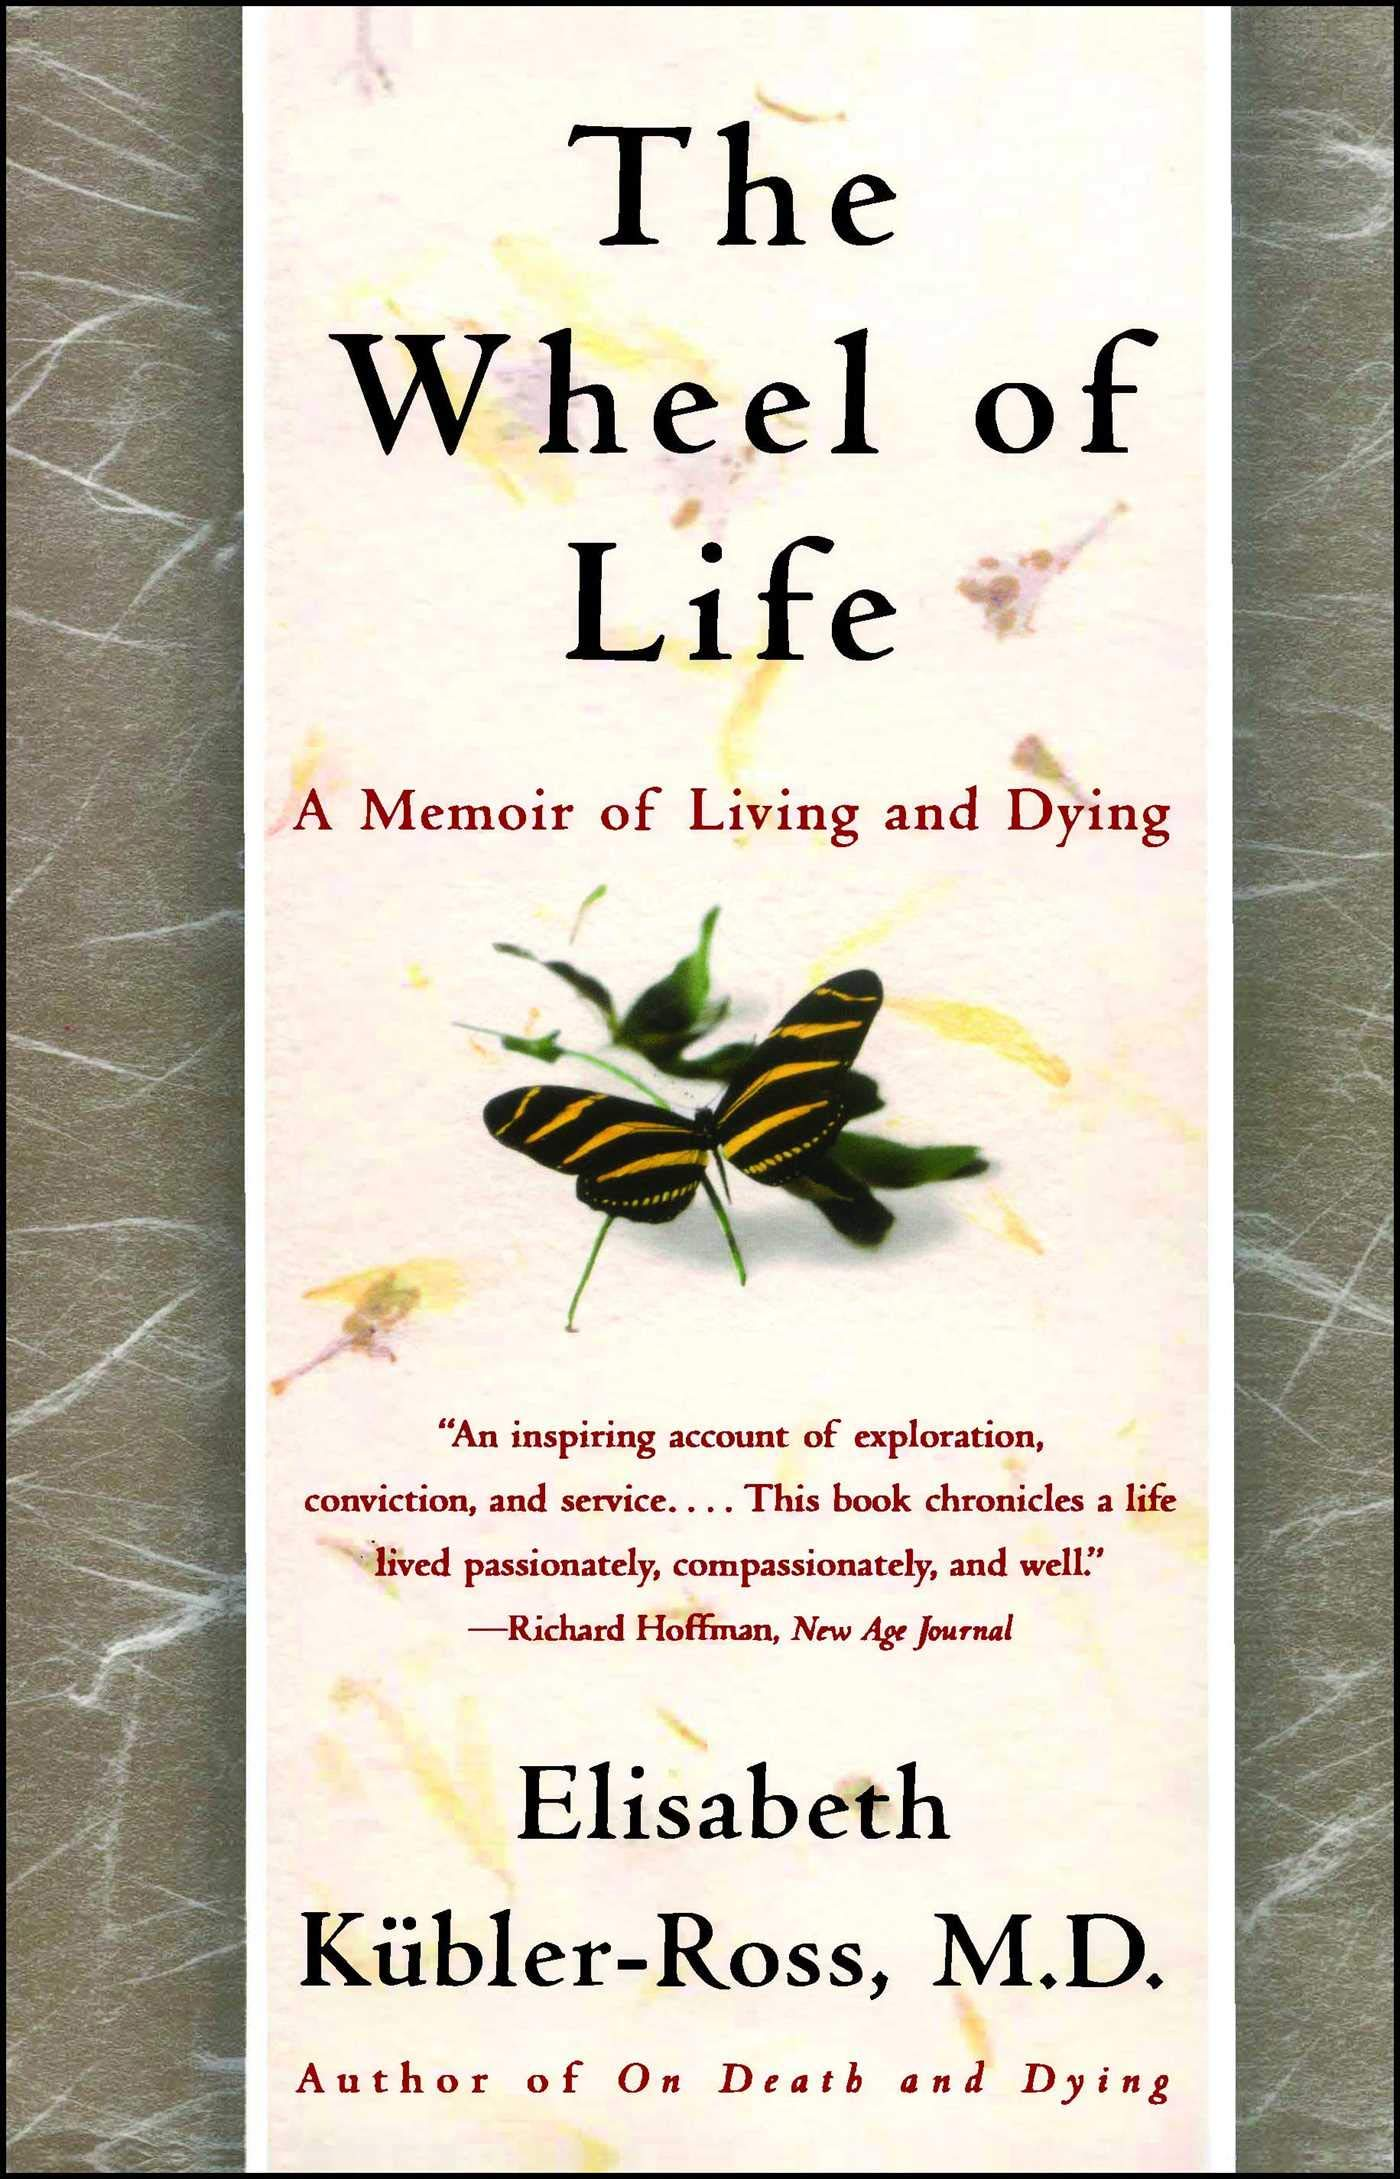 b9f6ea3da7f The Wheel of Life: A Memoir of Living and Dying: Elisabeth Kubler ...